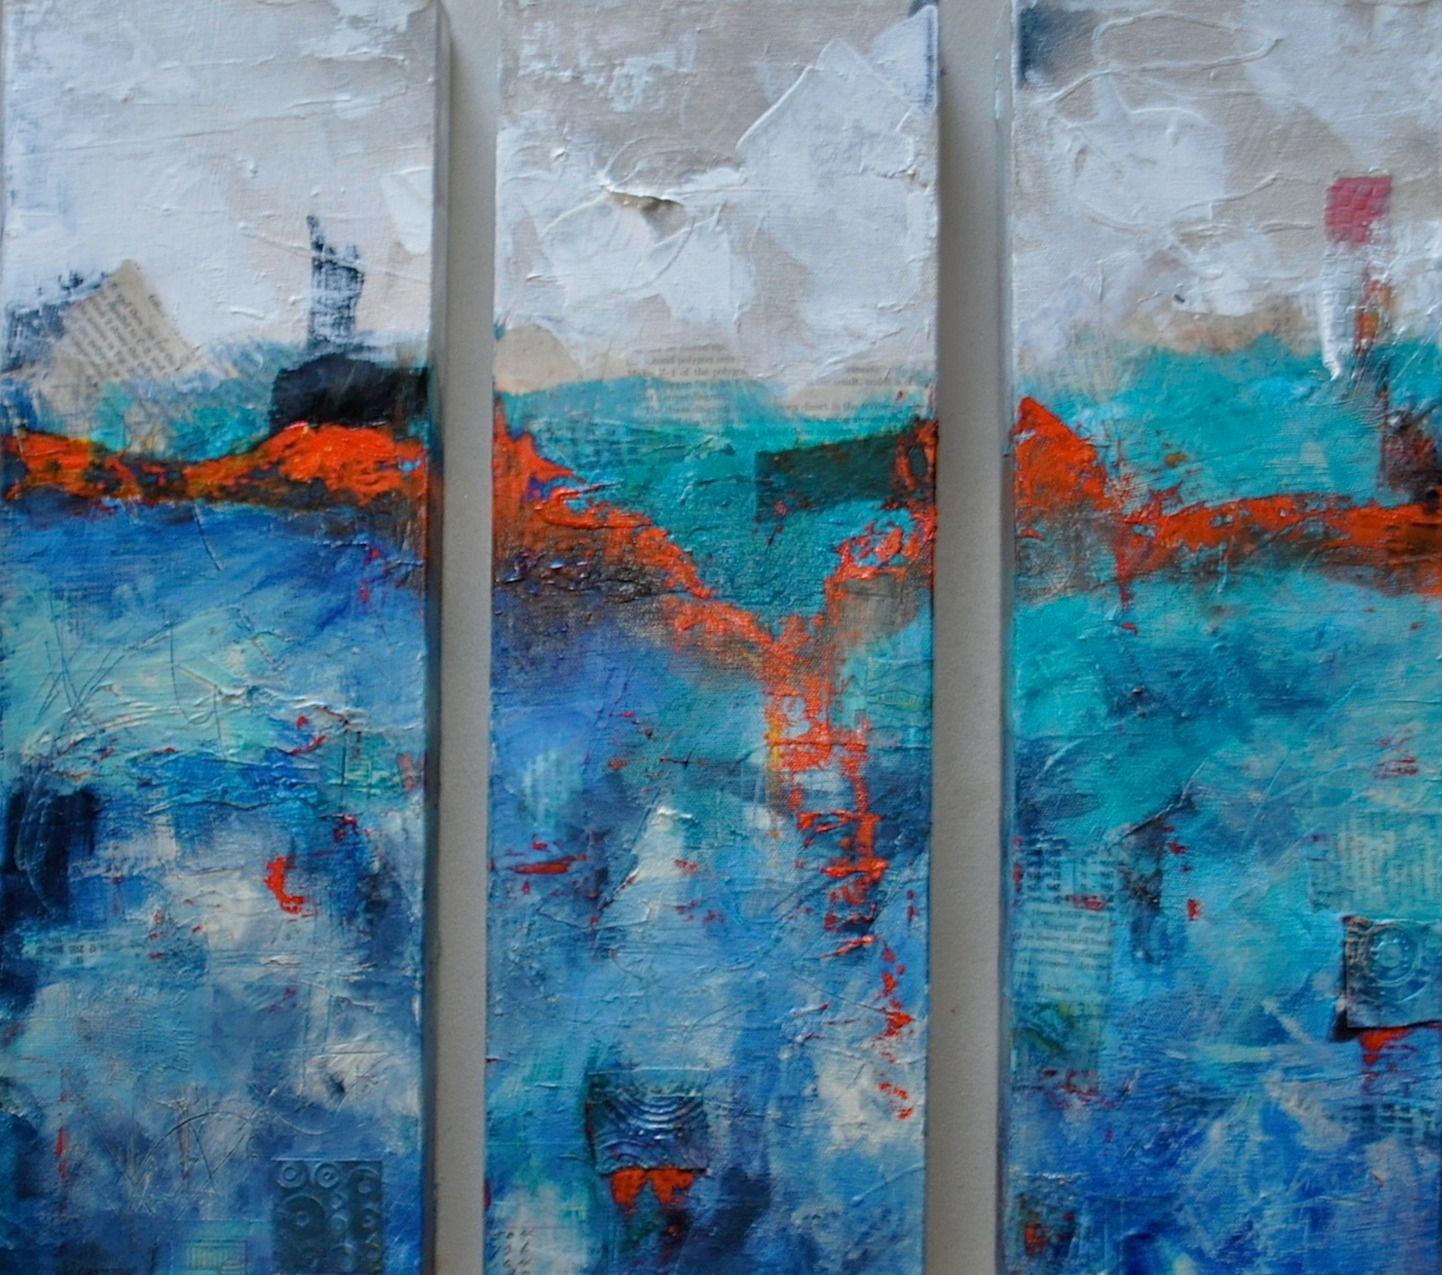 Seascape triptych